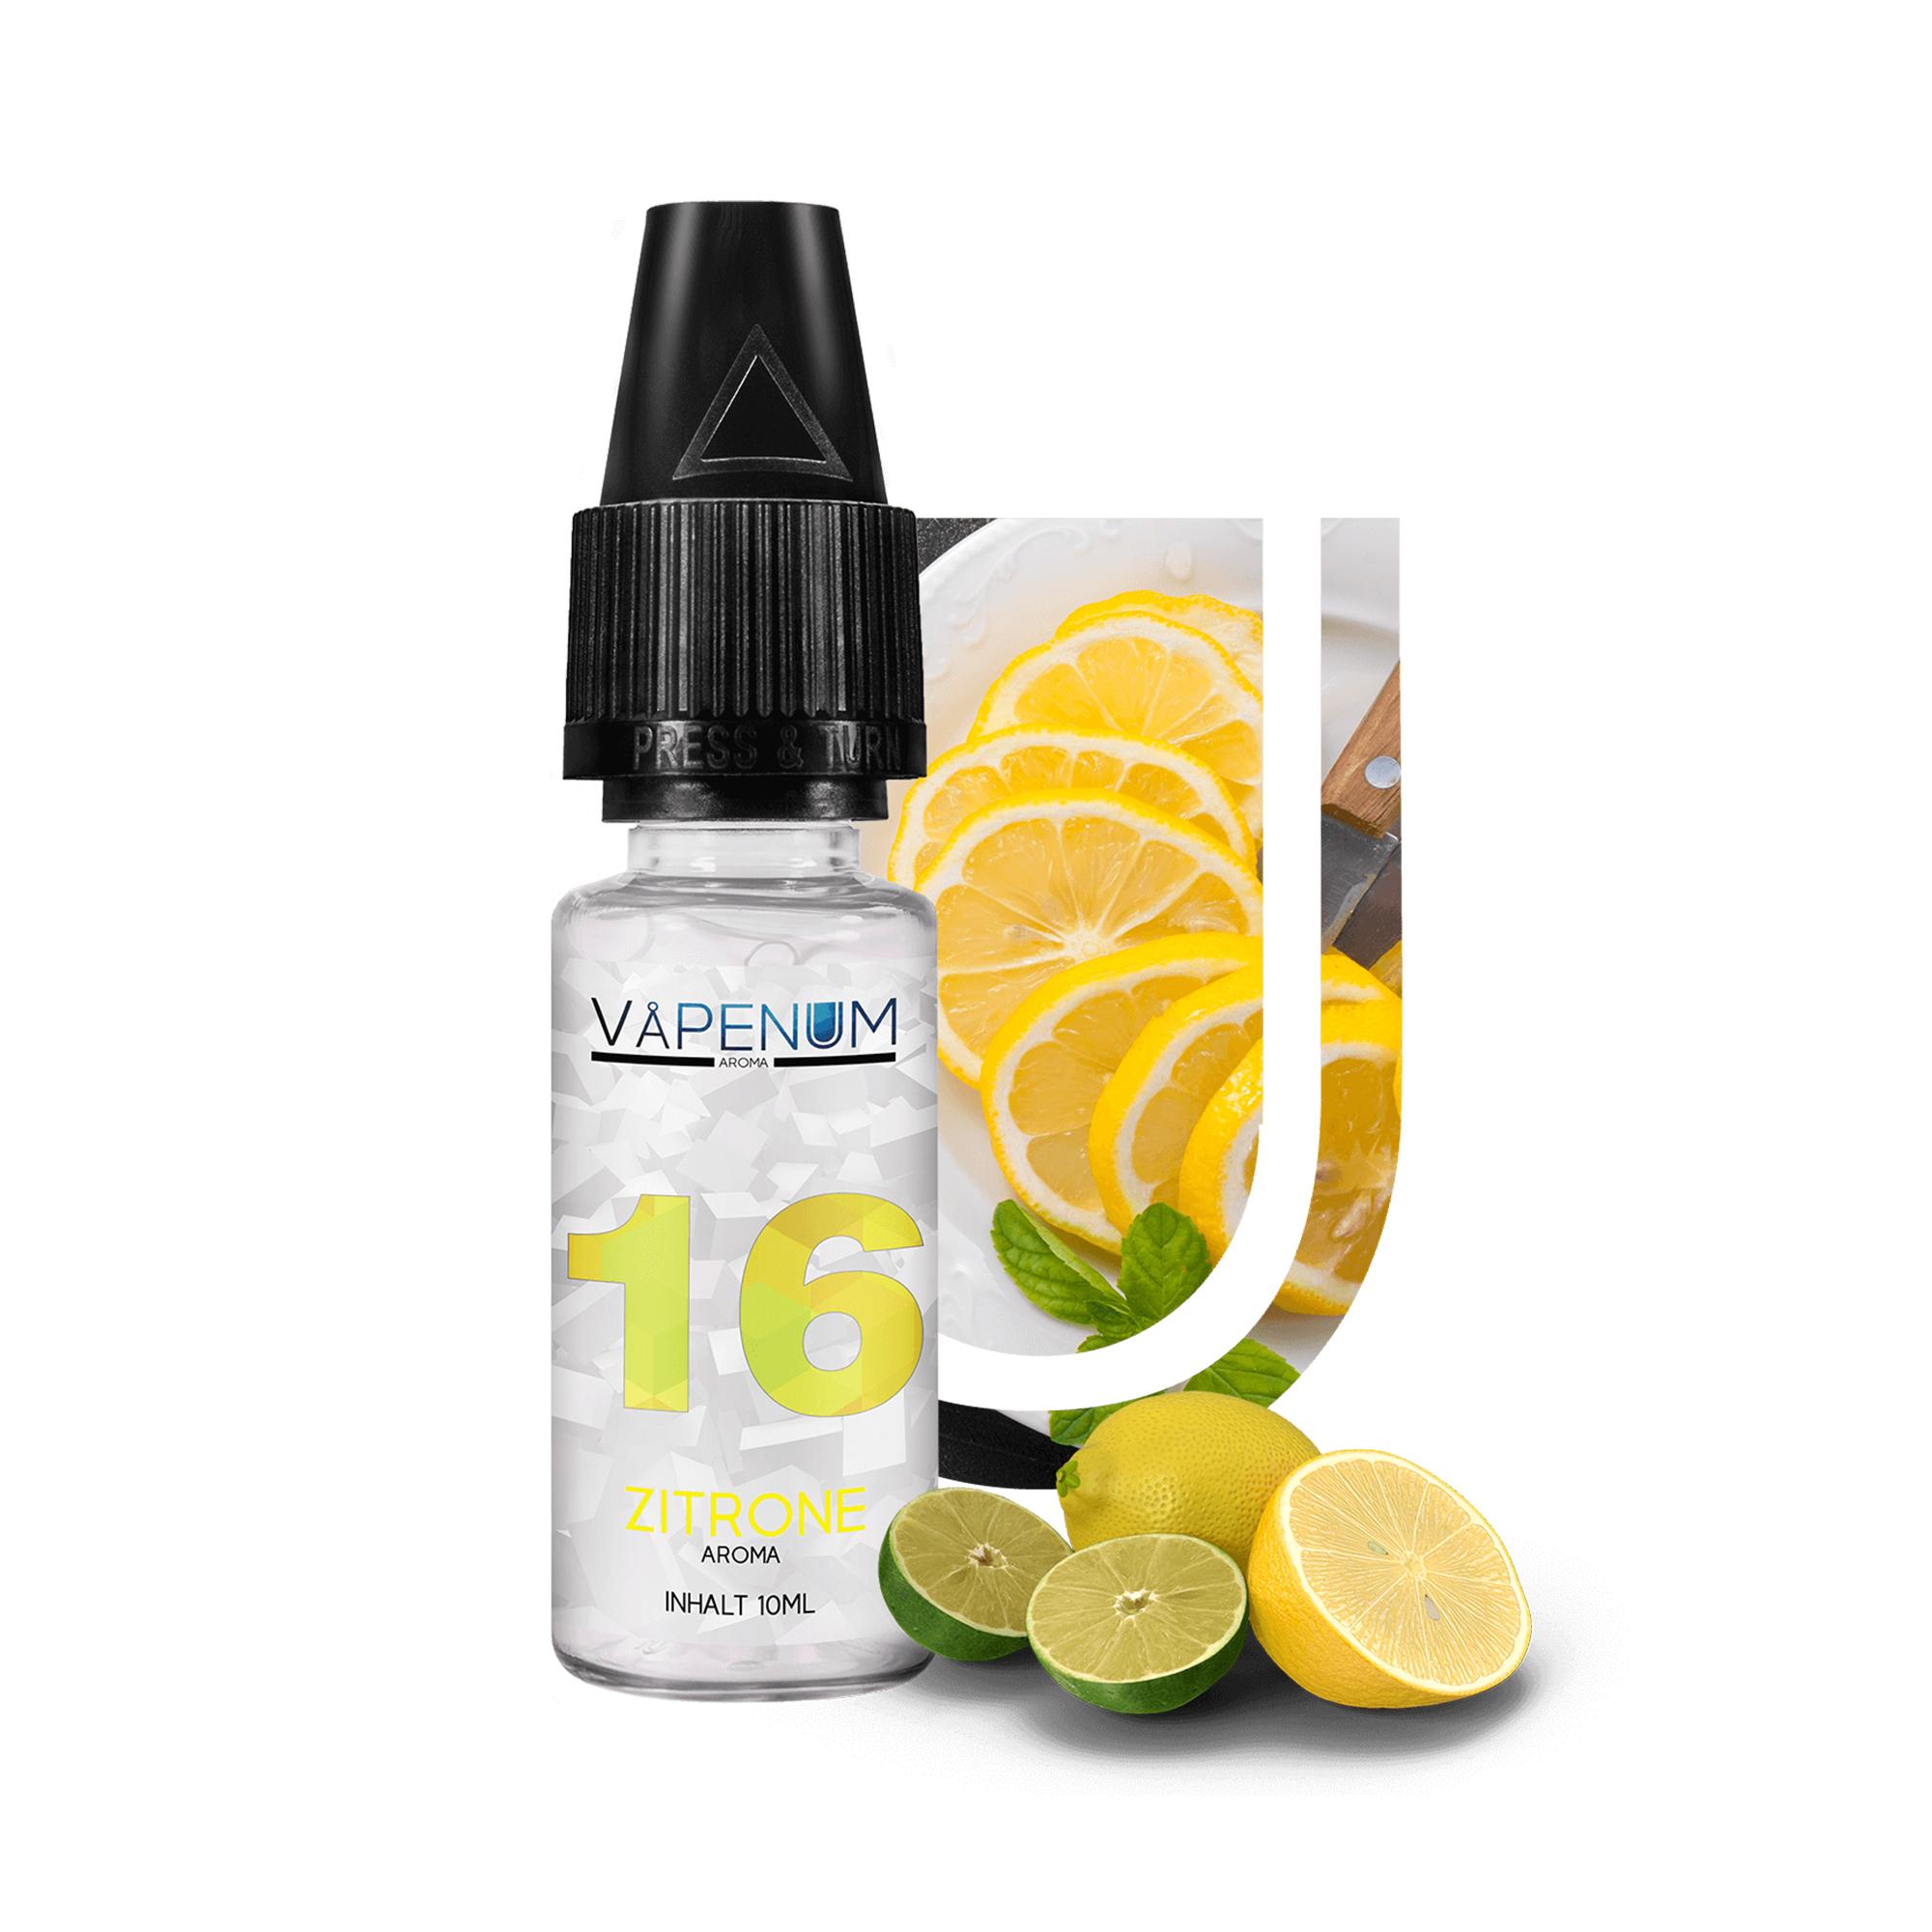 16 - Zitrone Aroma by Vapenum